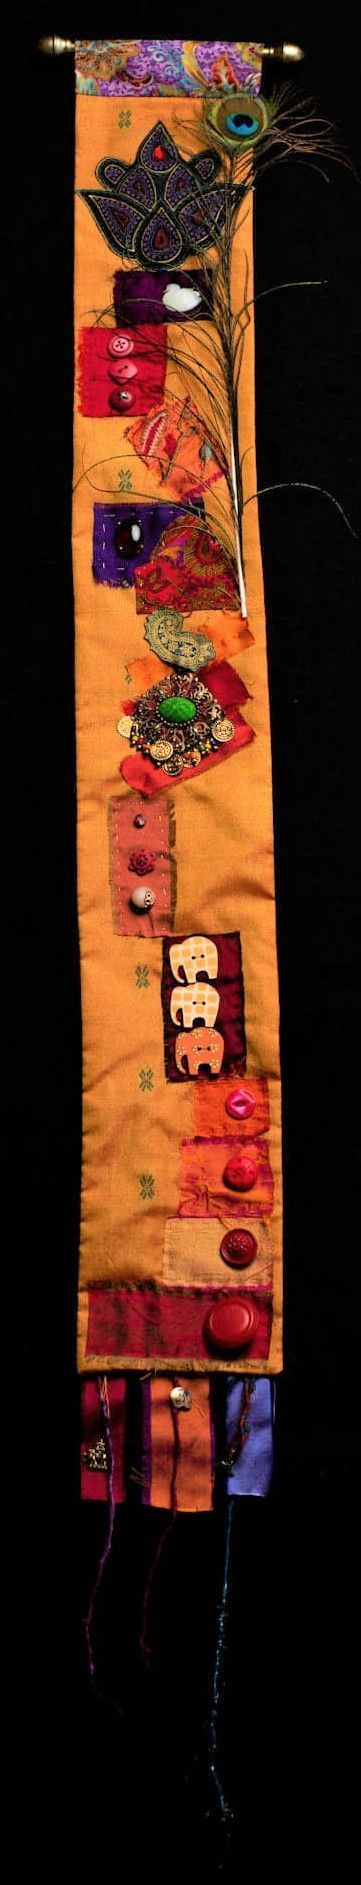 "Sherry Henrickson - ""To See the Elephants"""